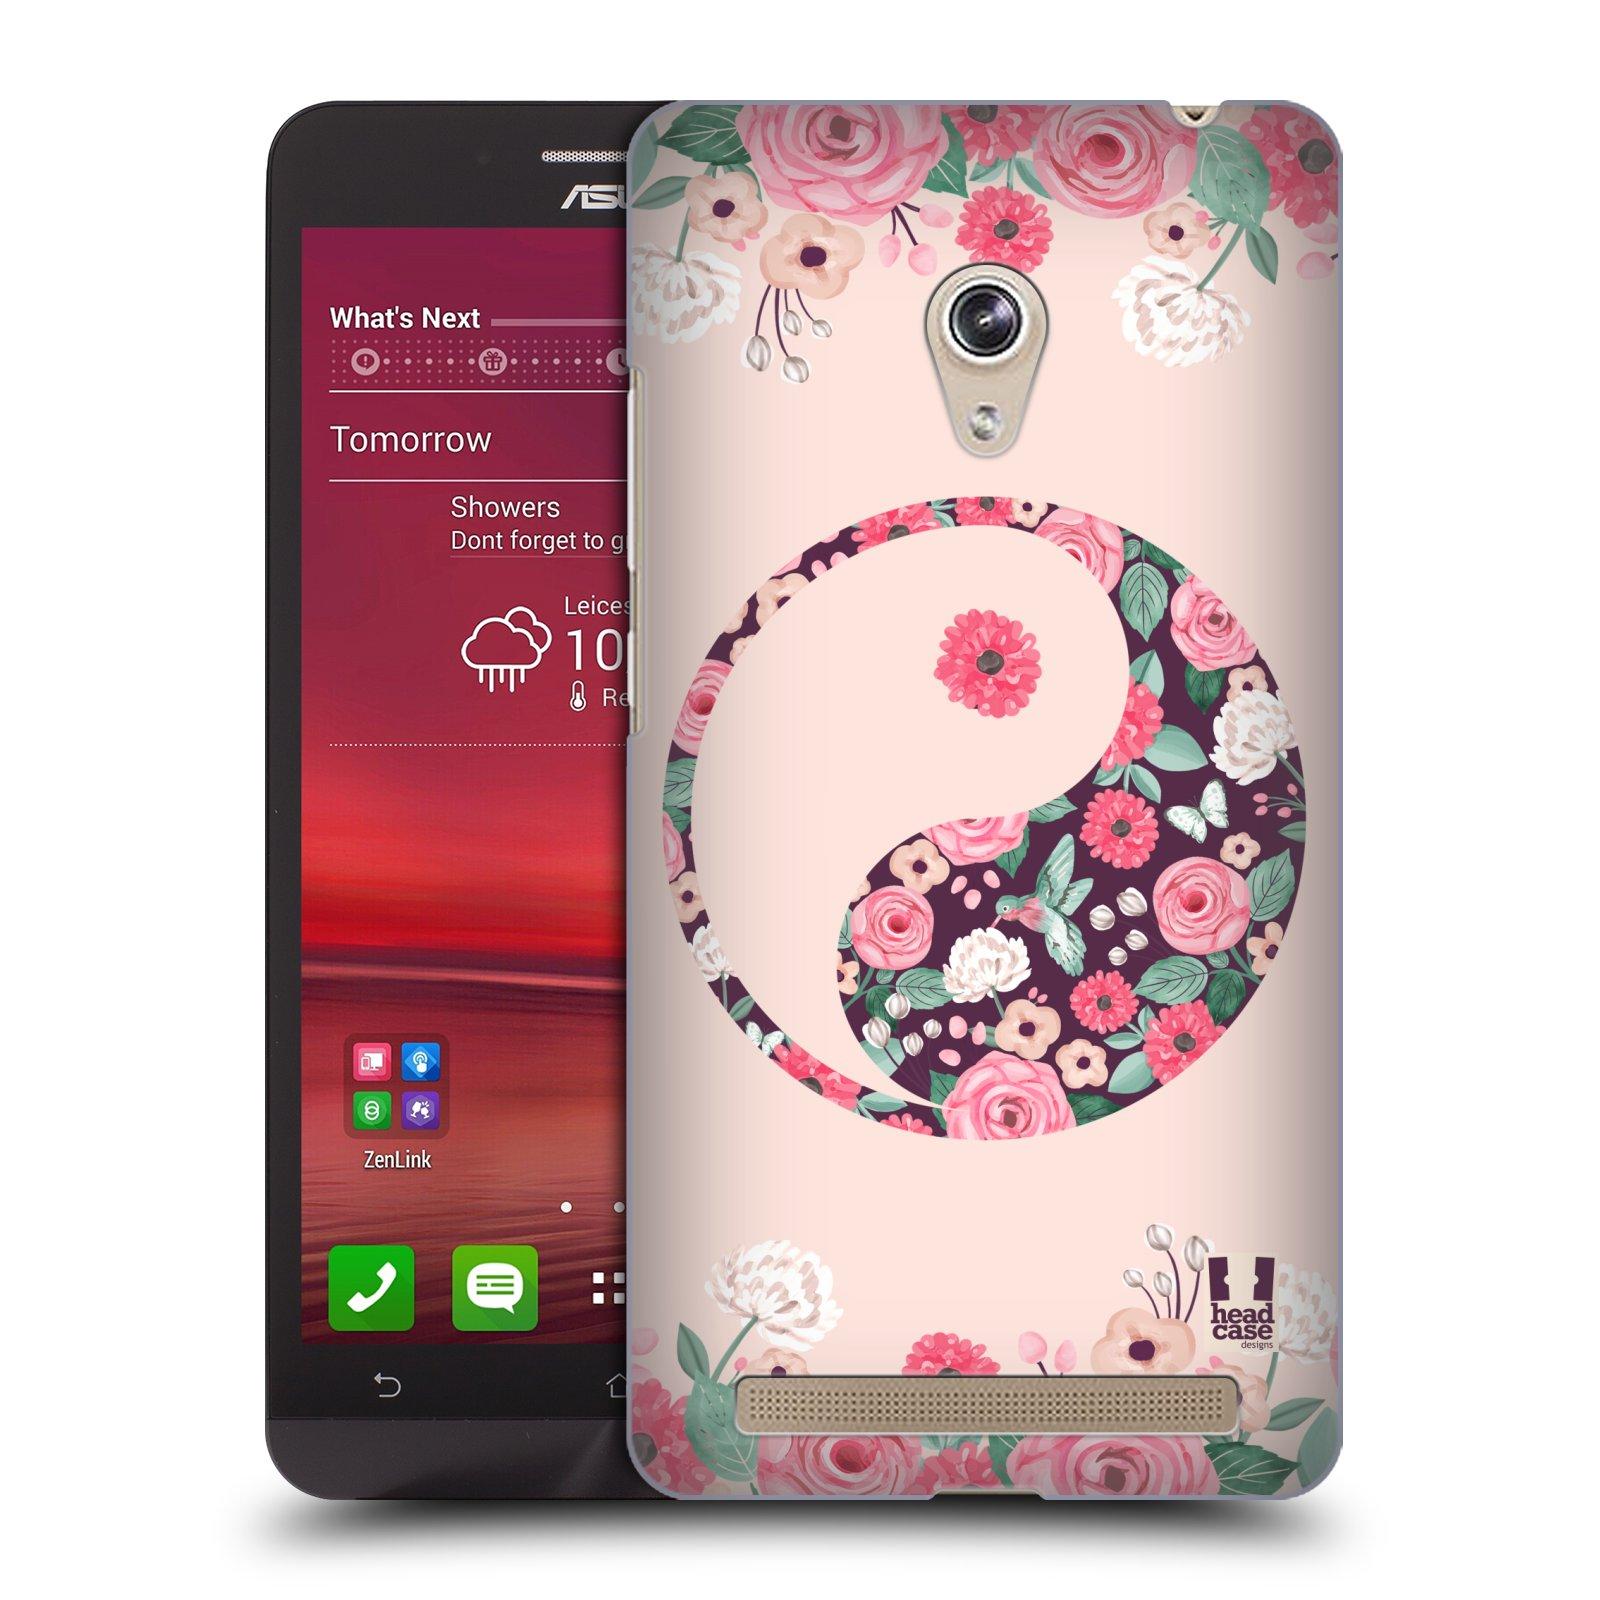 Plastové pouzdro na mobil Asus Zenfone 6 HEAD CASE Yin a Yang Floral (Kryt či obal na mobilní telefon Asus Zenfone 6 A600CG / A601CG)